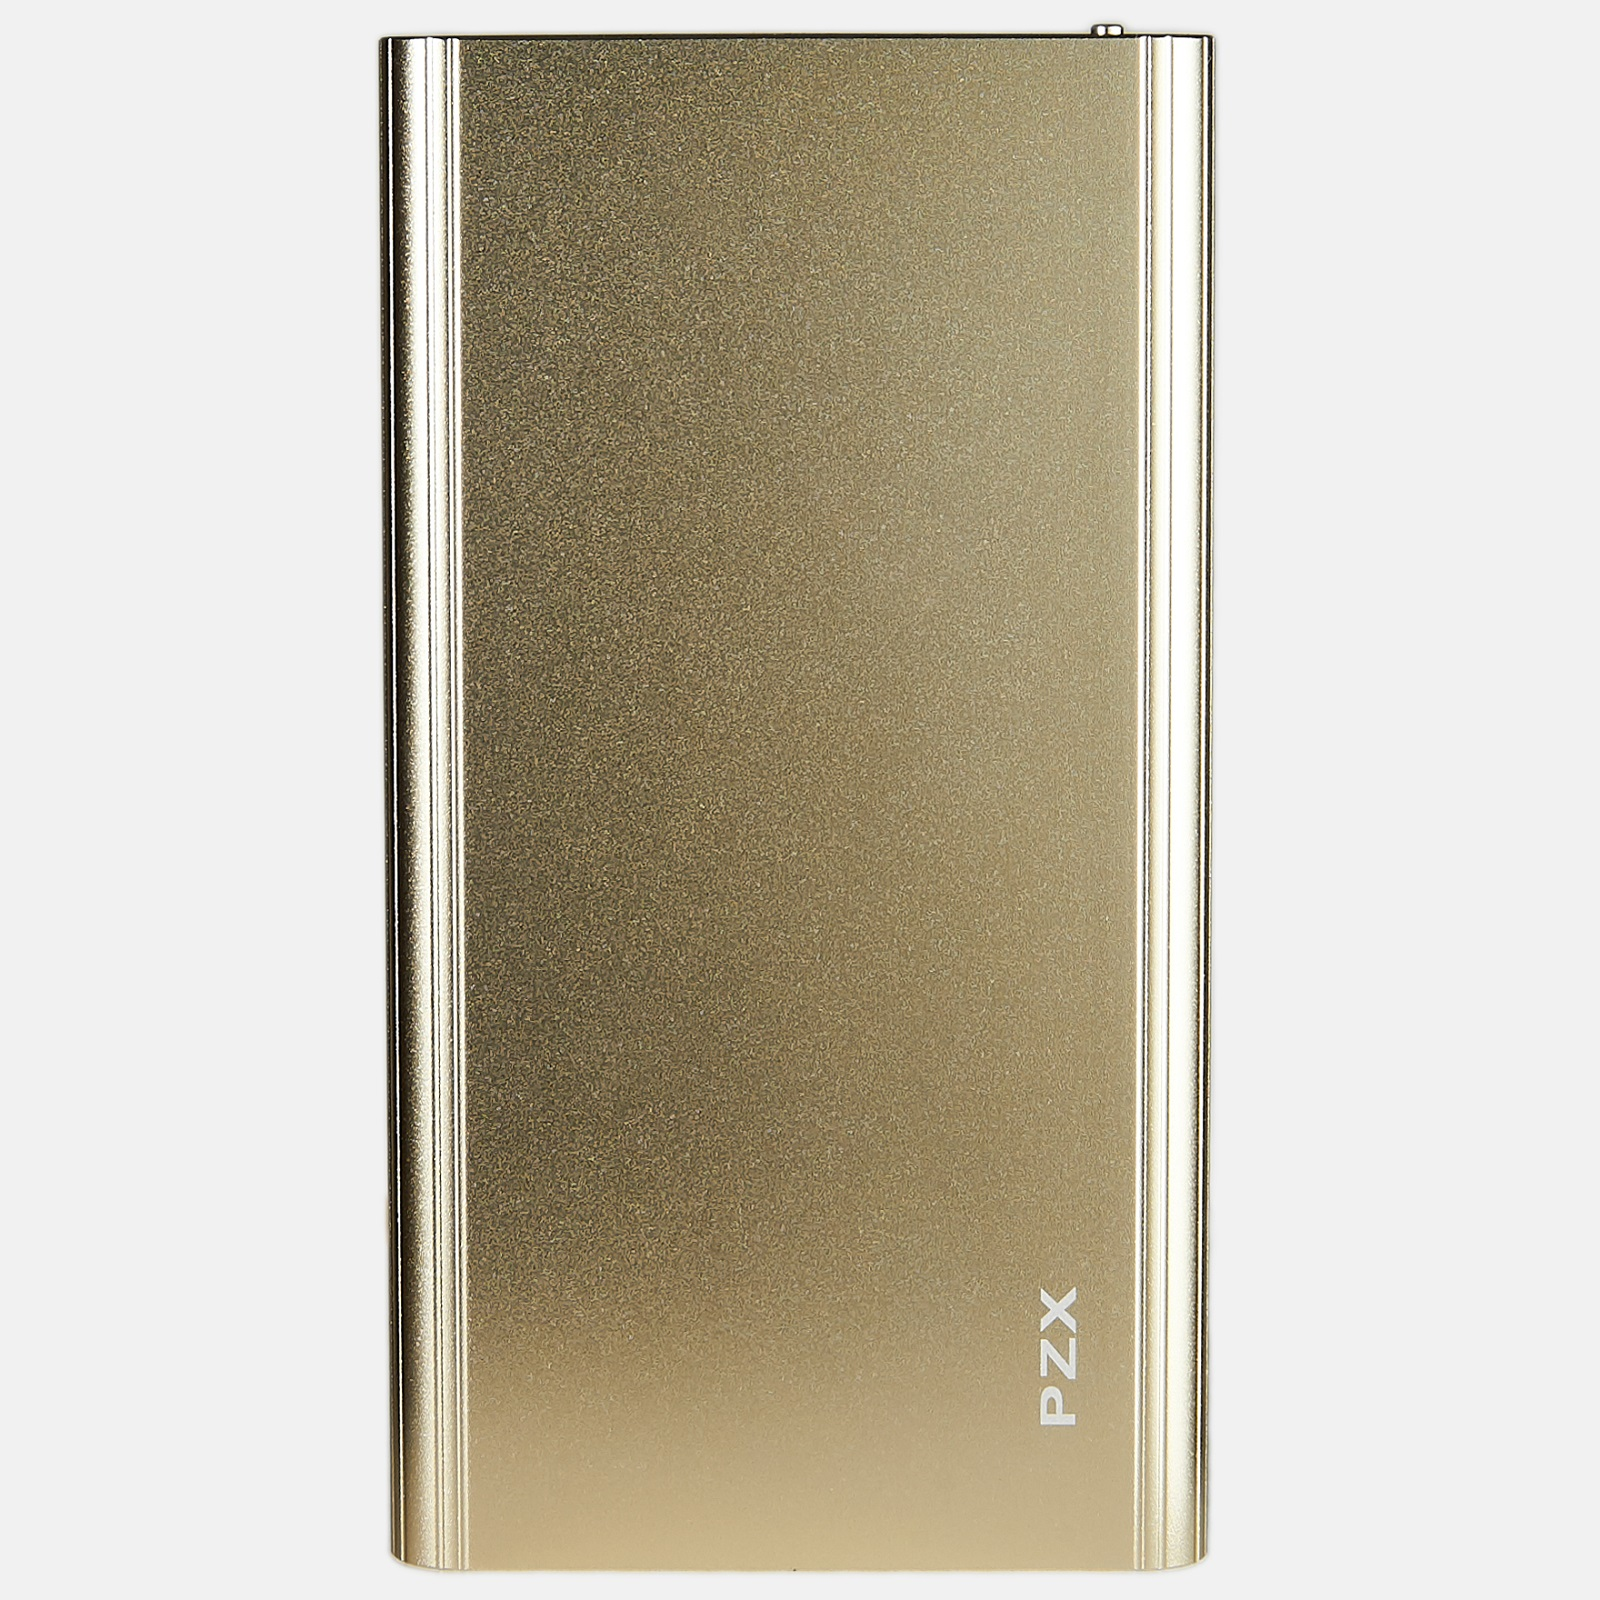 Внешний аккумулятор Kingleen PZX C158 20000 мАч Gold